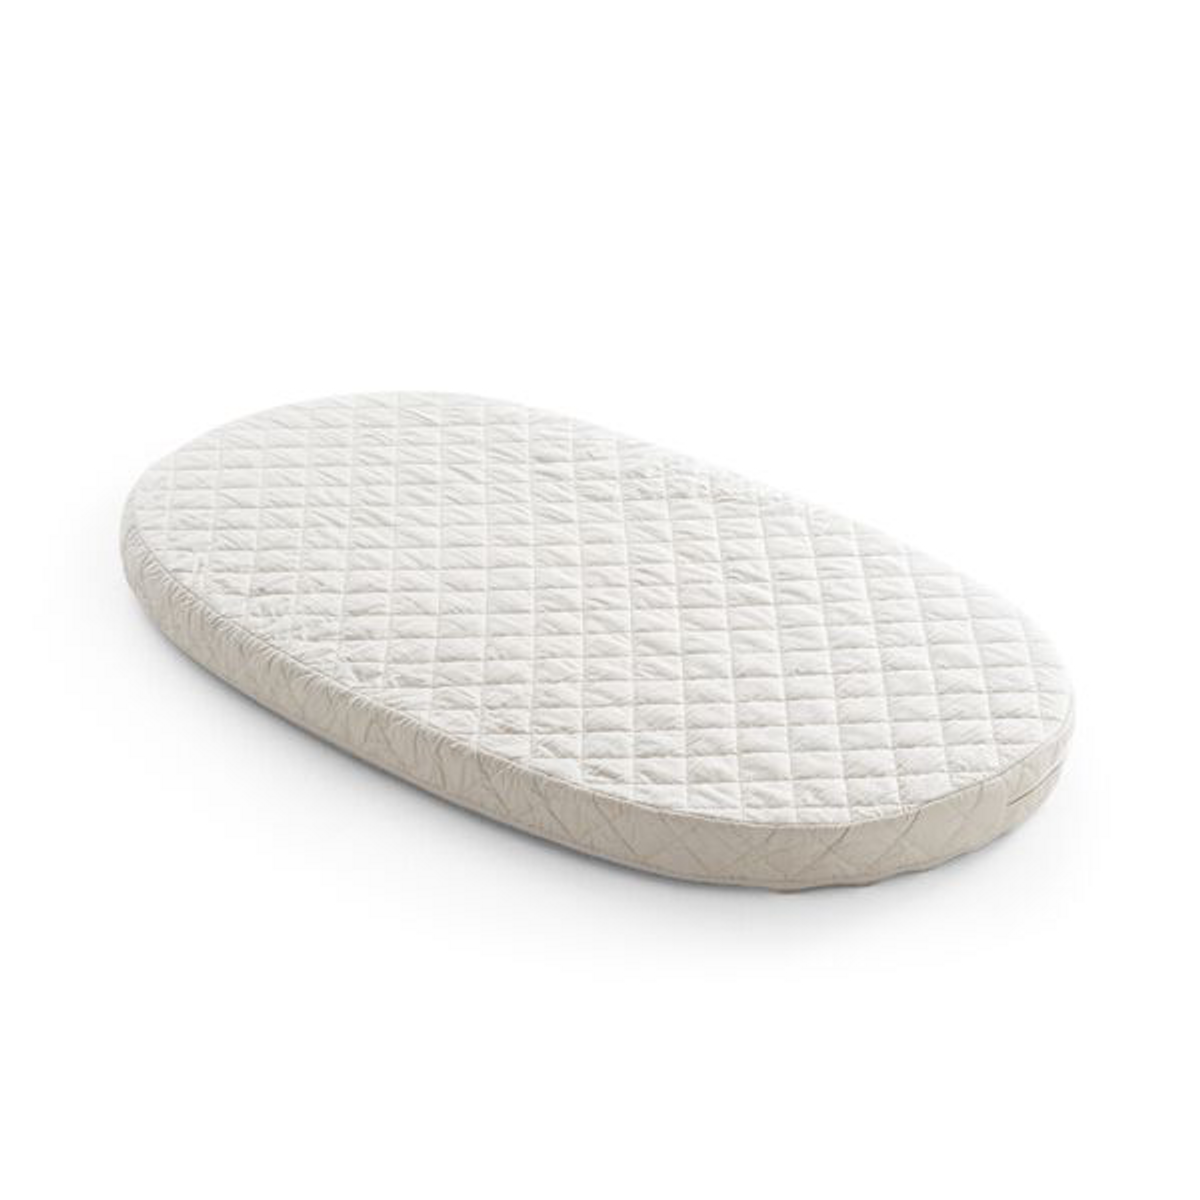 Stokke® Sleepi™ Bed Mattress